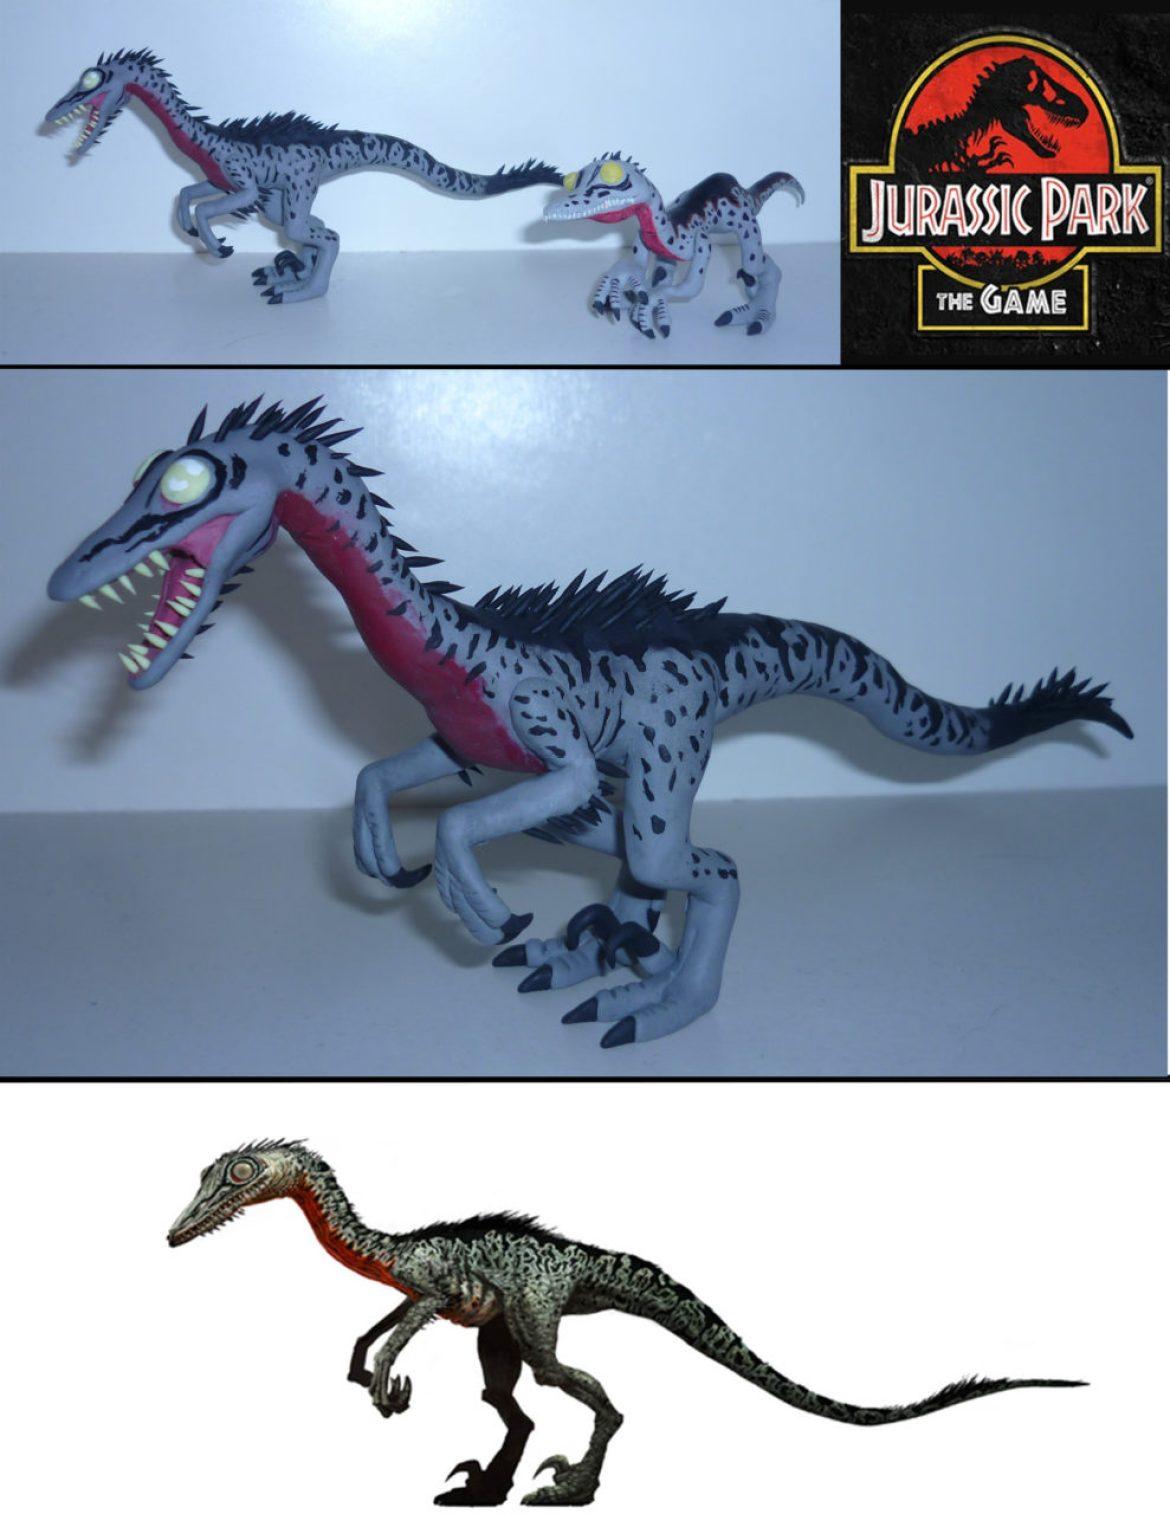 'Jurassic Park Troodon Sculpture'